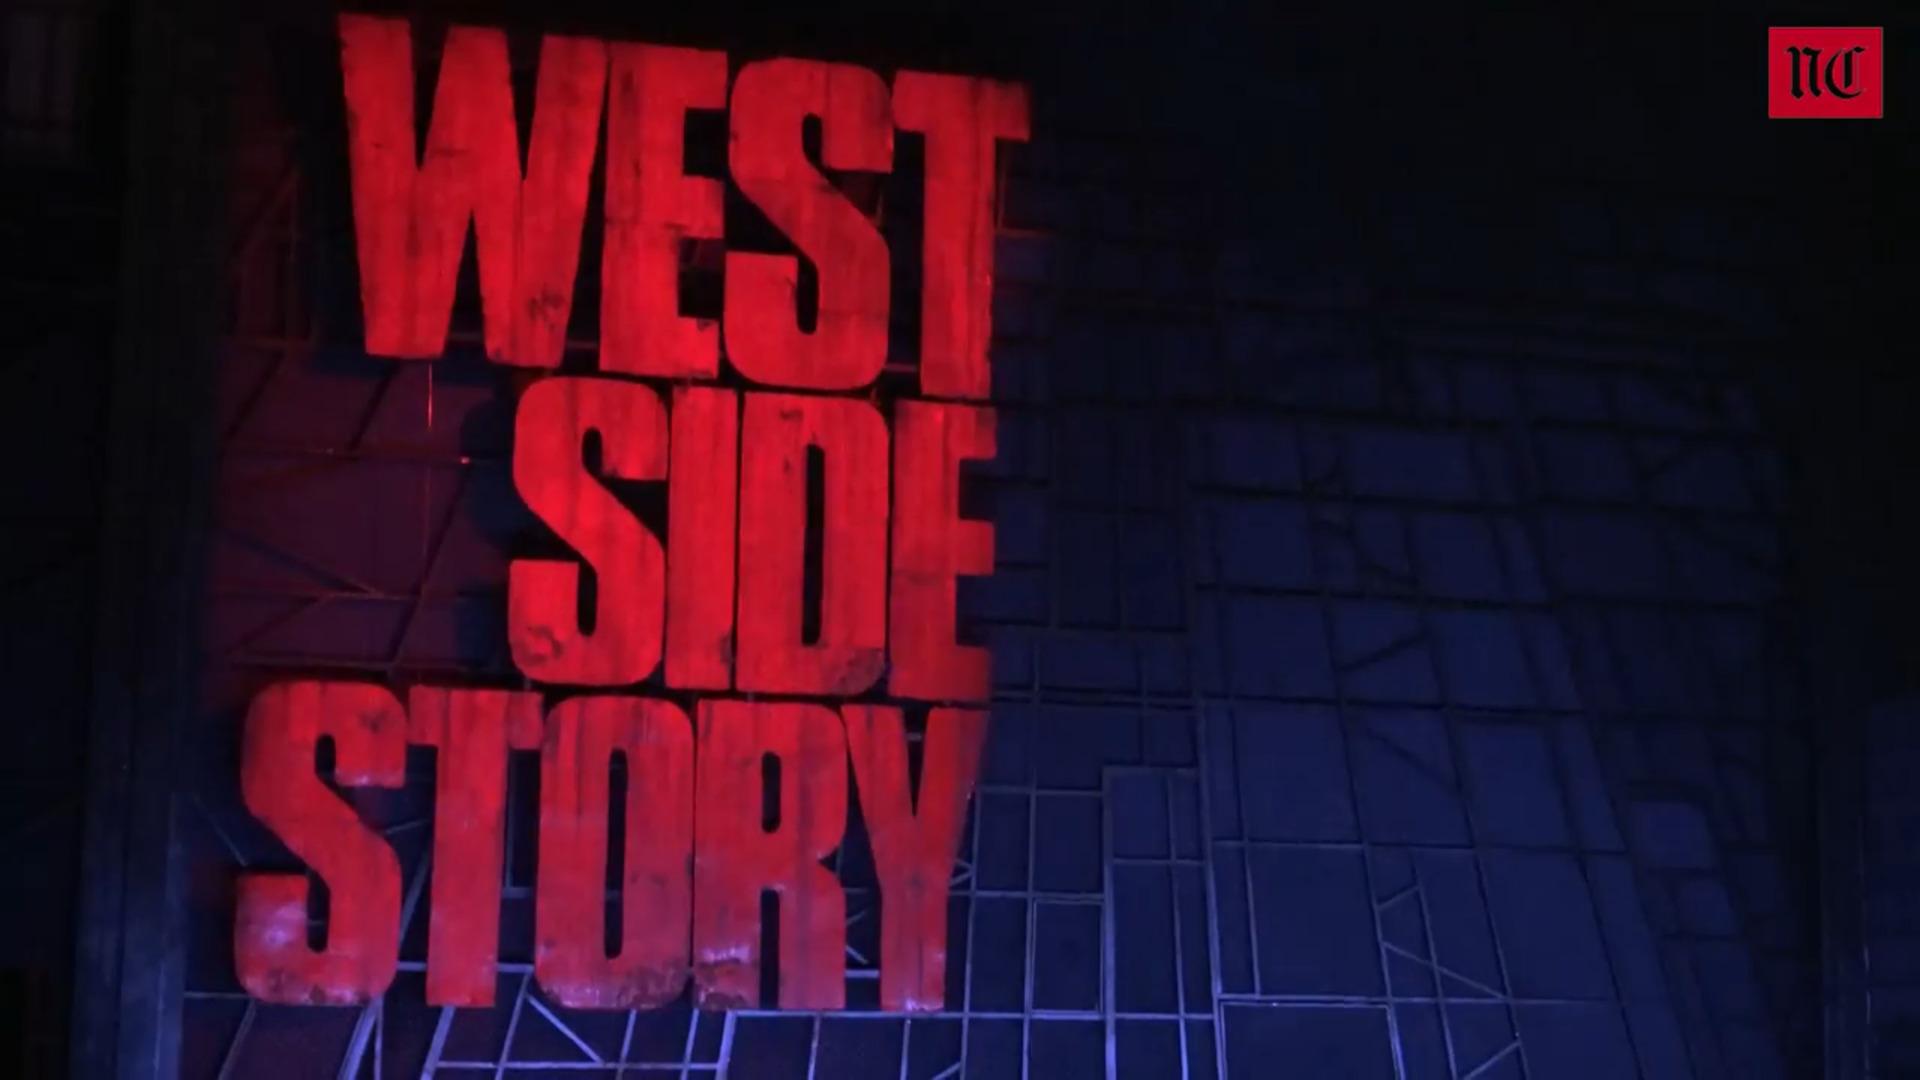 El musical West Side Story llega a Valladolid